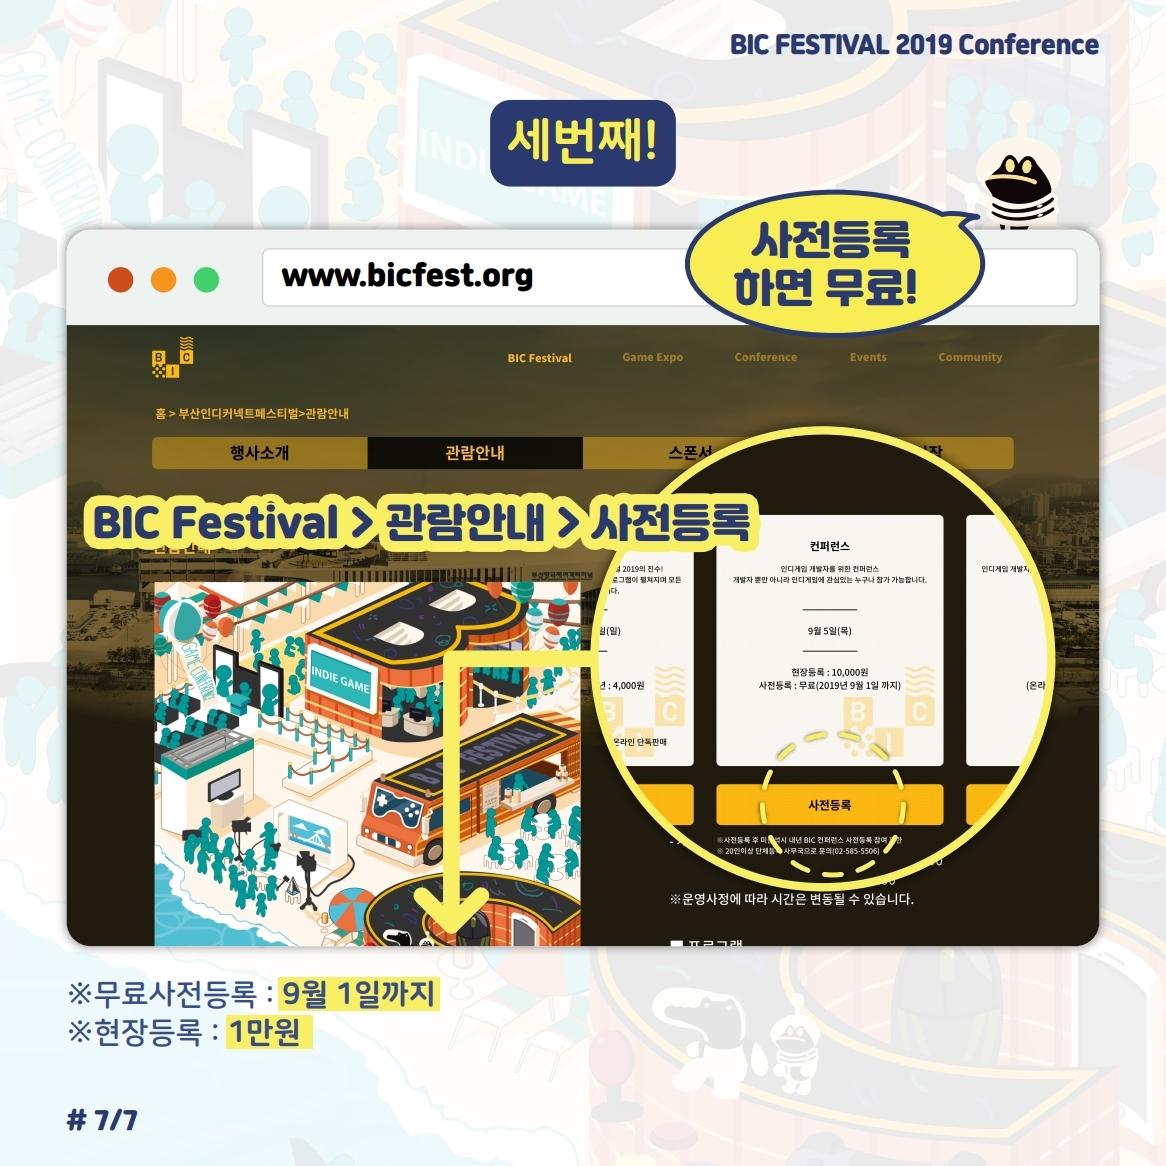 BIC_cardnews_01_Conference_07.jpg